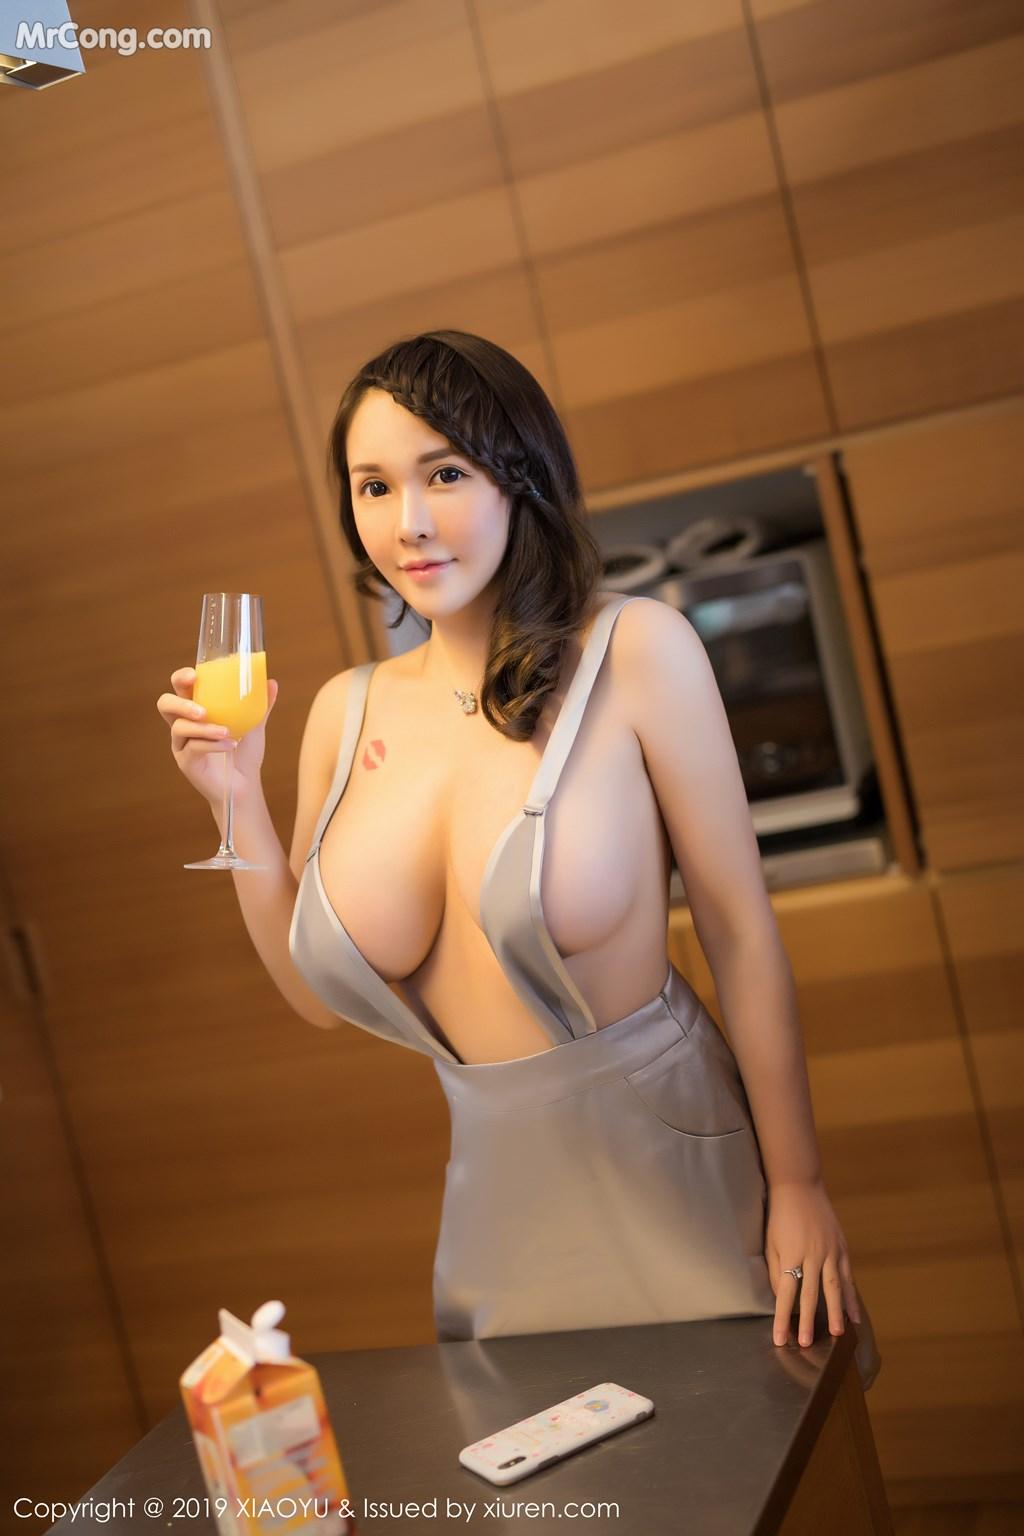 Image XiaoYu-Vol.080-miko-MrCong.com-008 in post XiaoYu Vol.080: 沈蜜桃miko (47 ảnh)